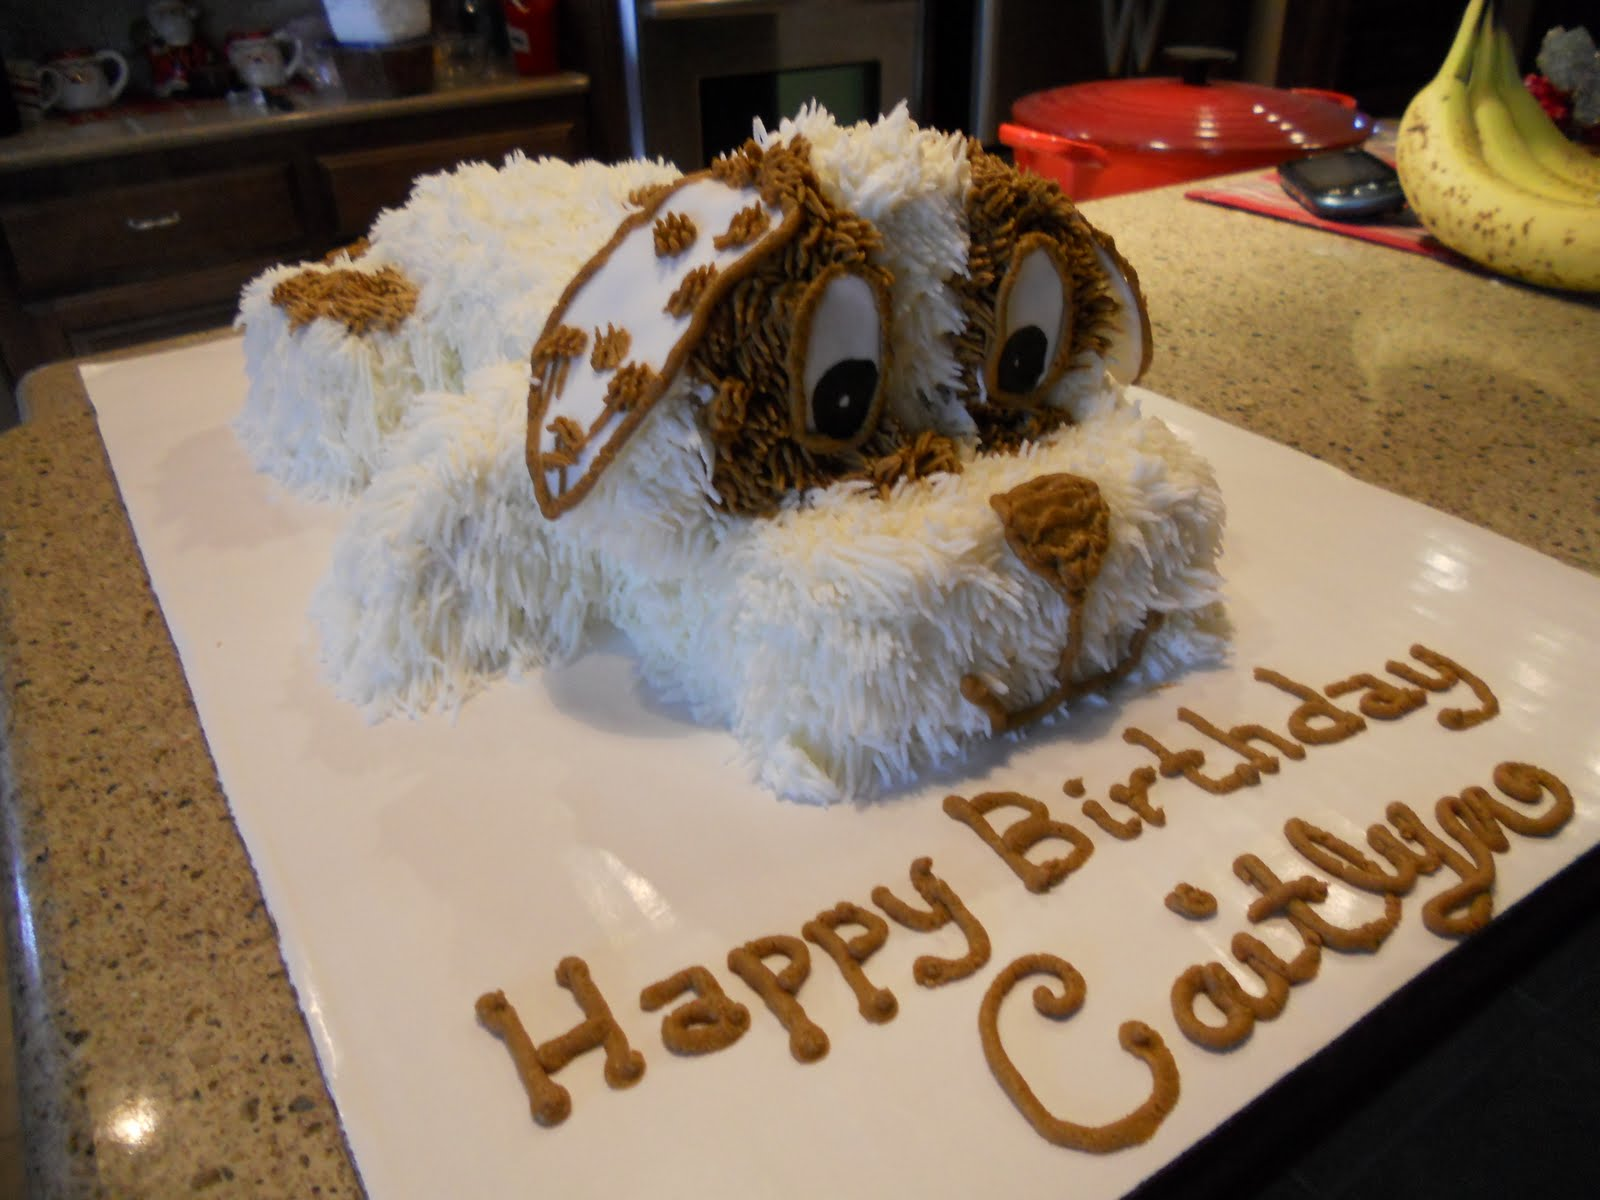 Treat Dreams Puppy Dog Cake